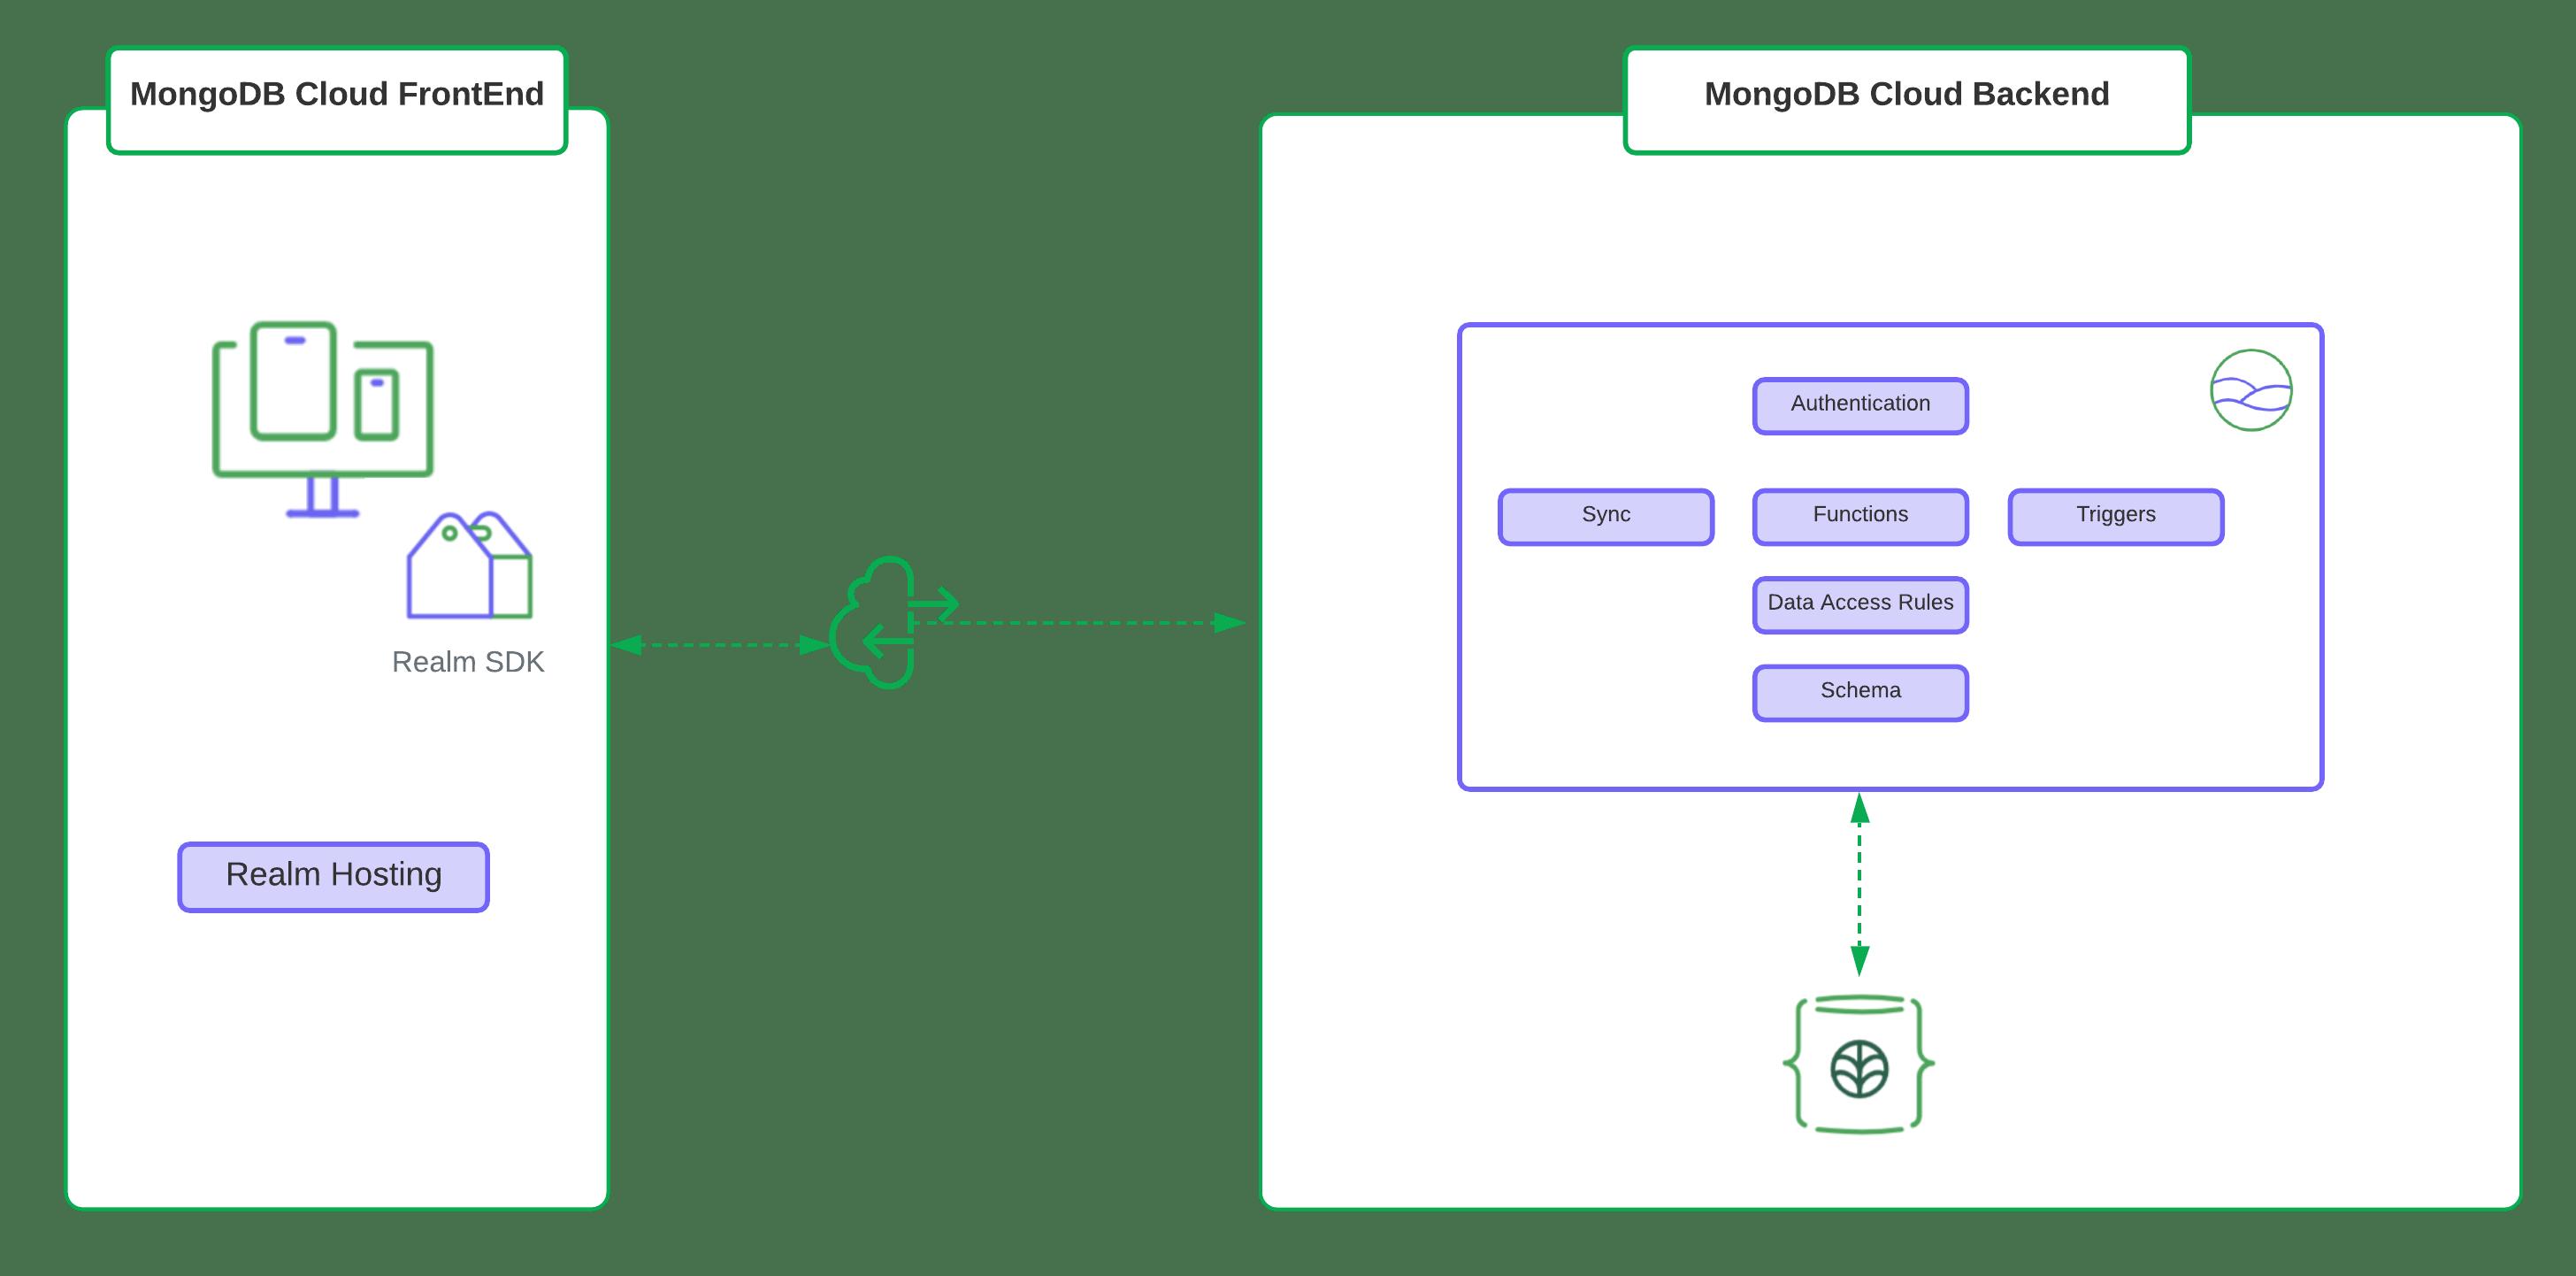 Example of Web App using MongoDB Cloud